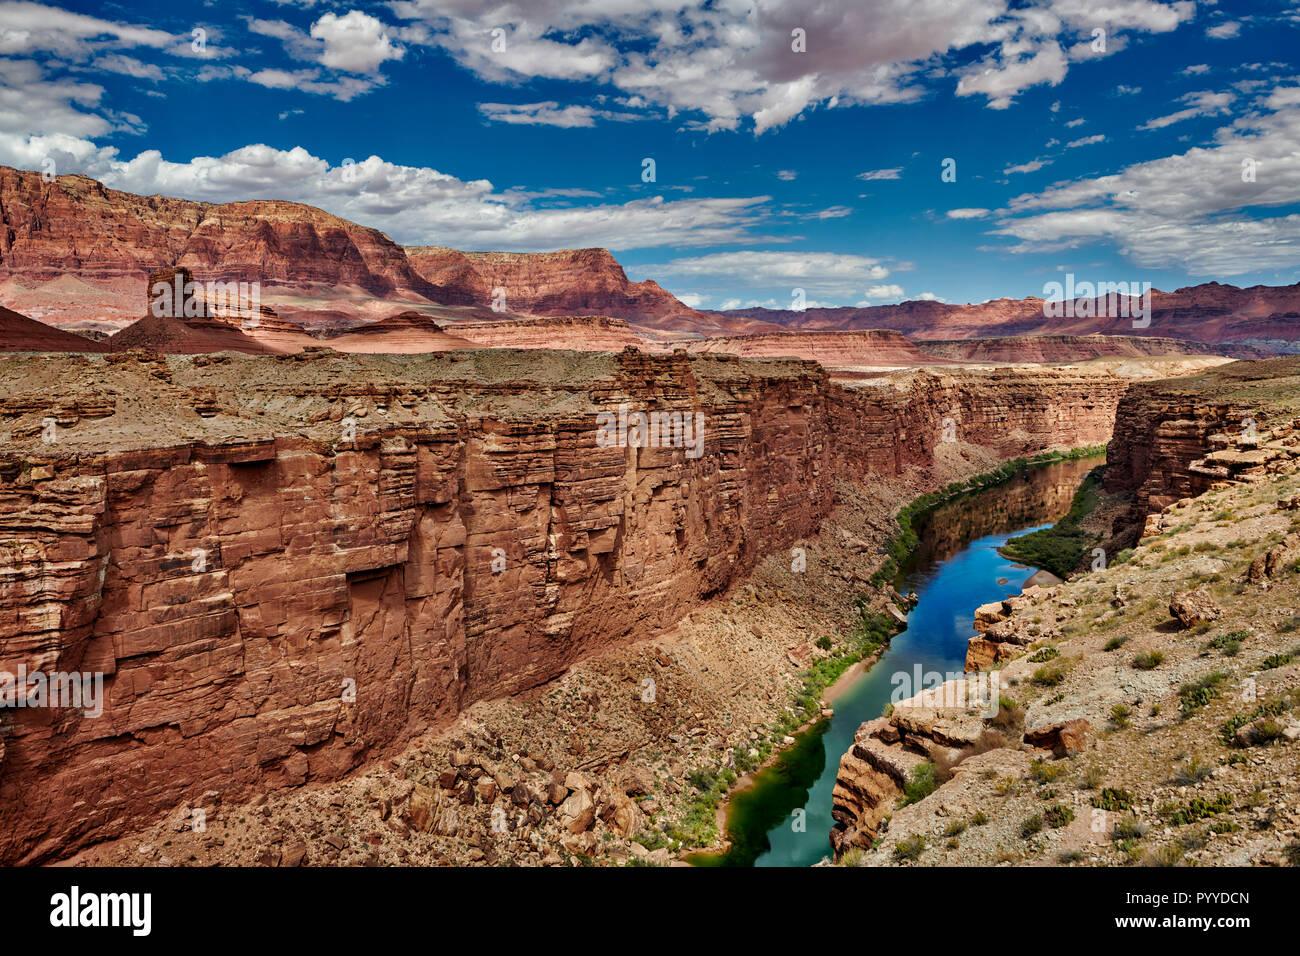 Marble Canyon and Vermillion Cliffs, Arizona, USA, North America Stock Photo